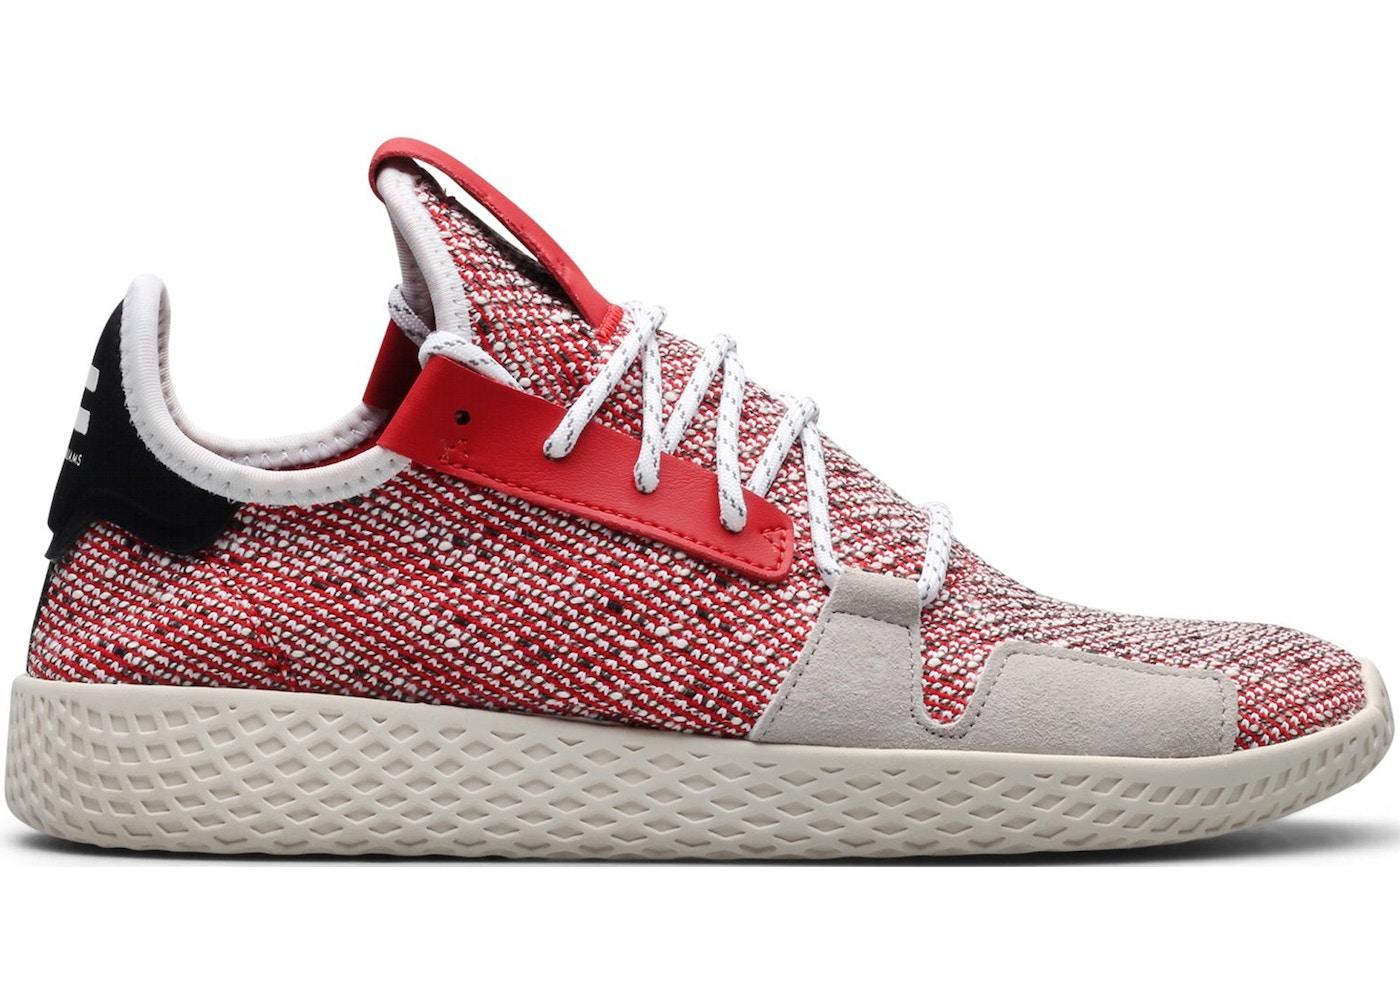 2f31ebd6 adidas Tennis Hu V2 Pharrell Solar Pack Scarlet - BB9542